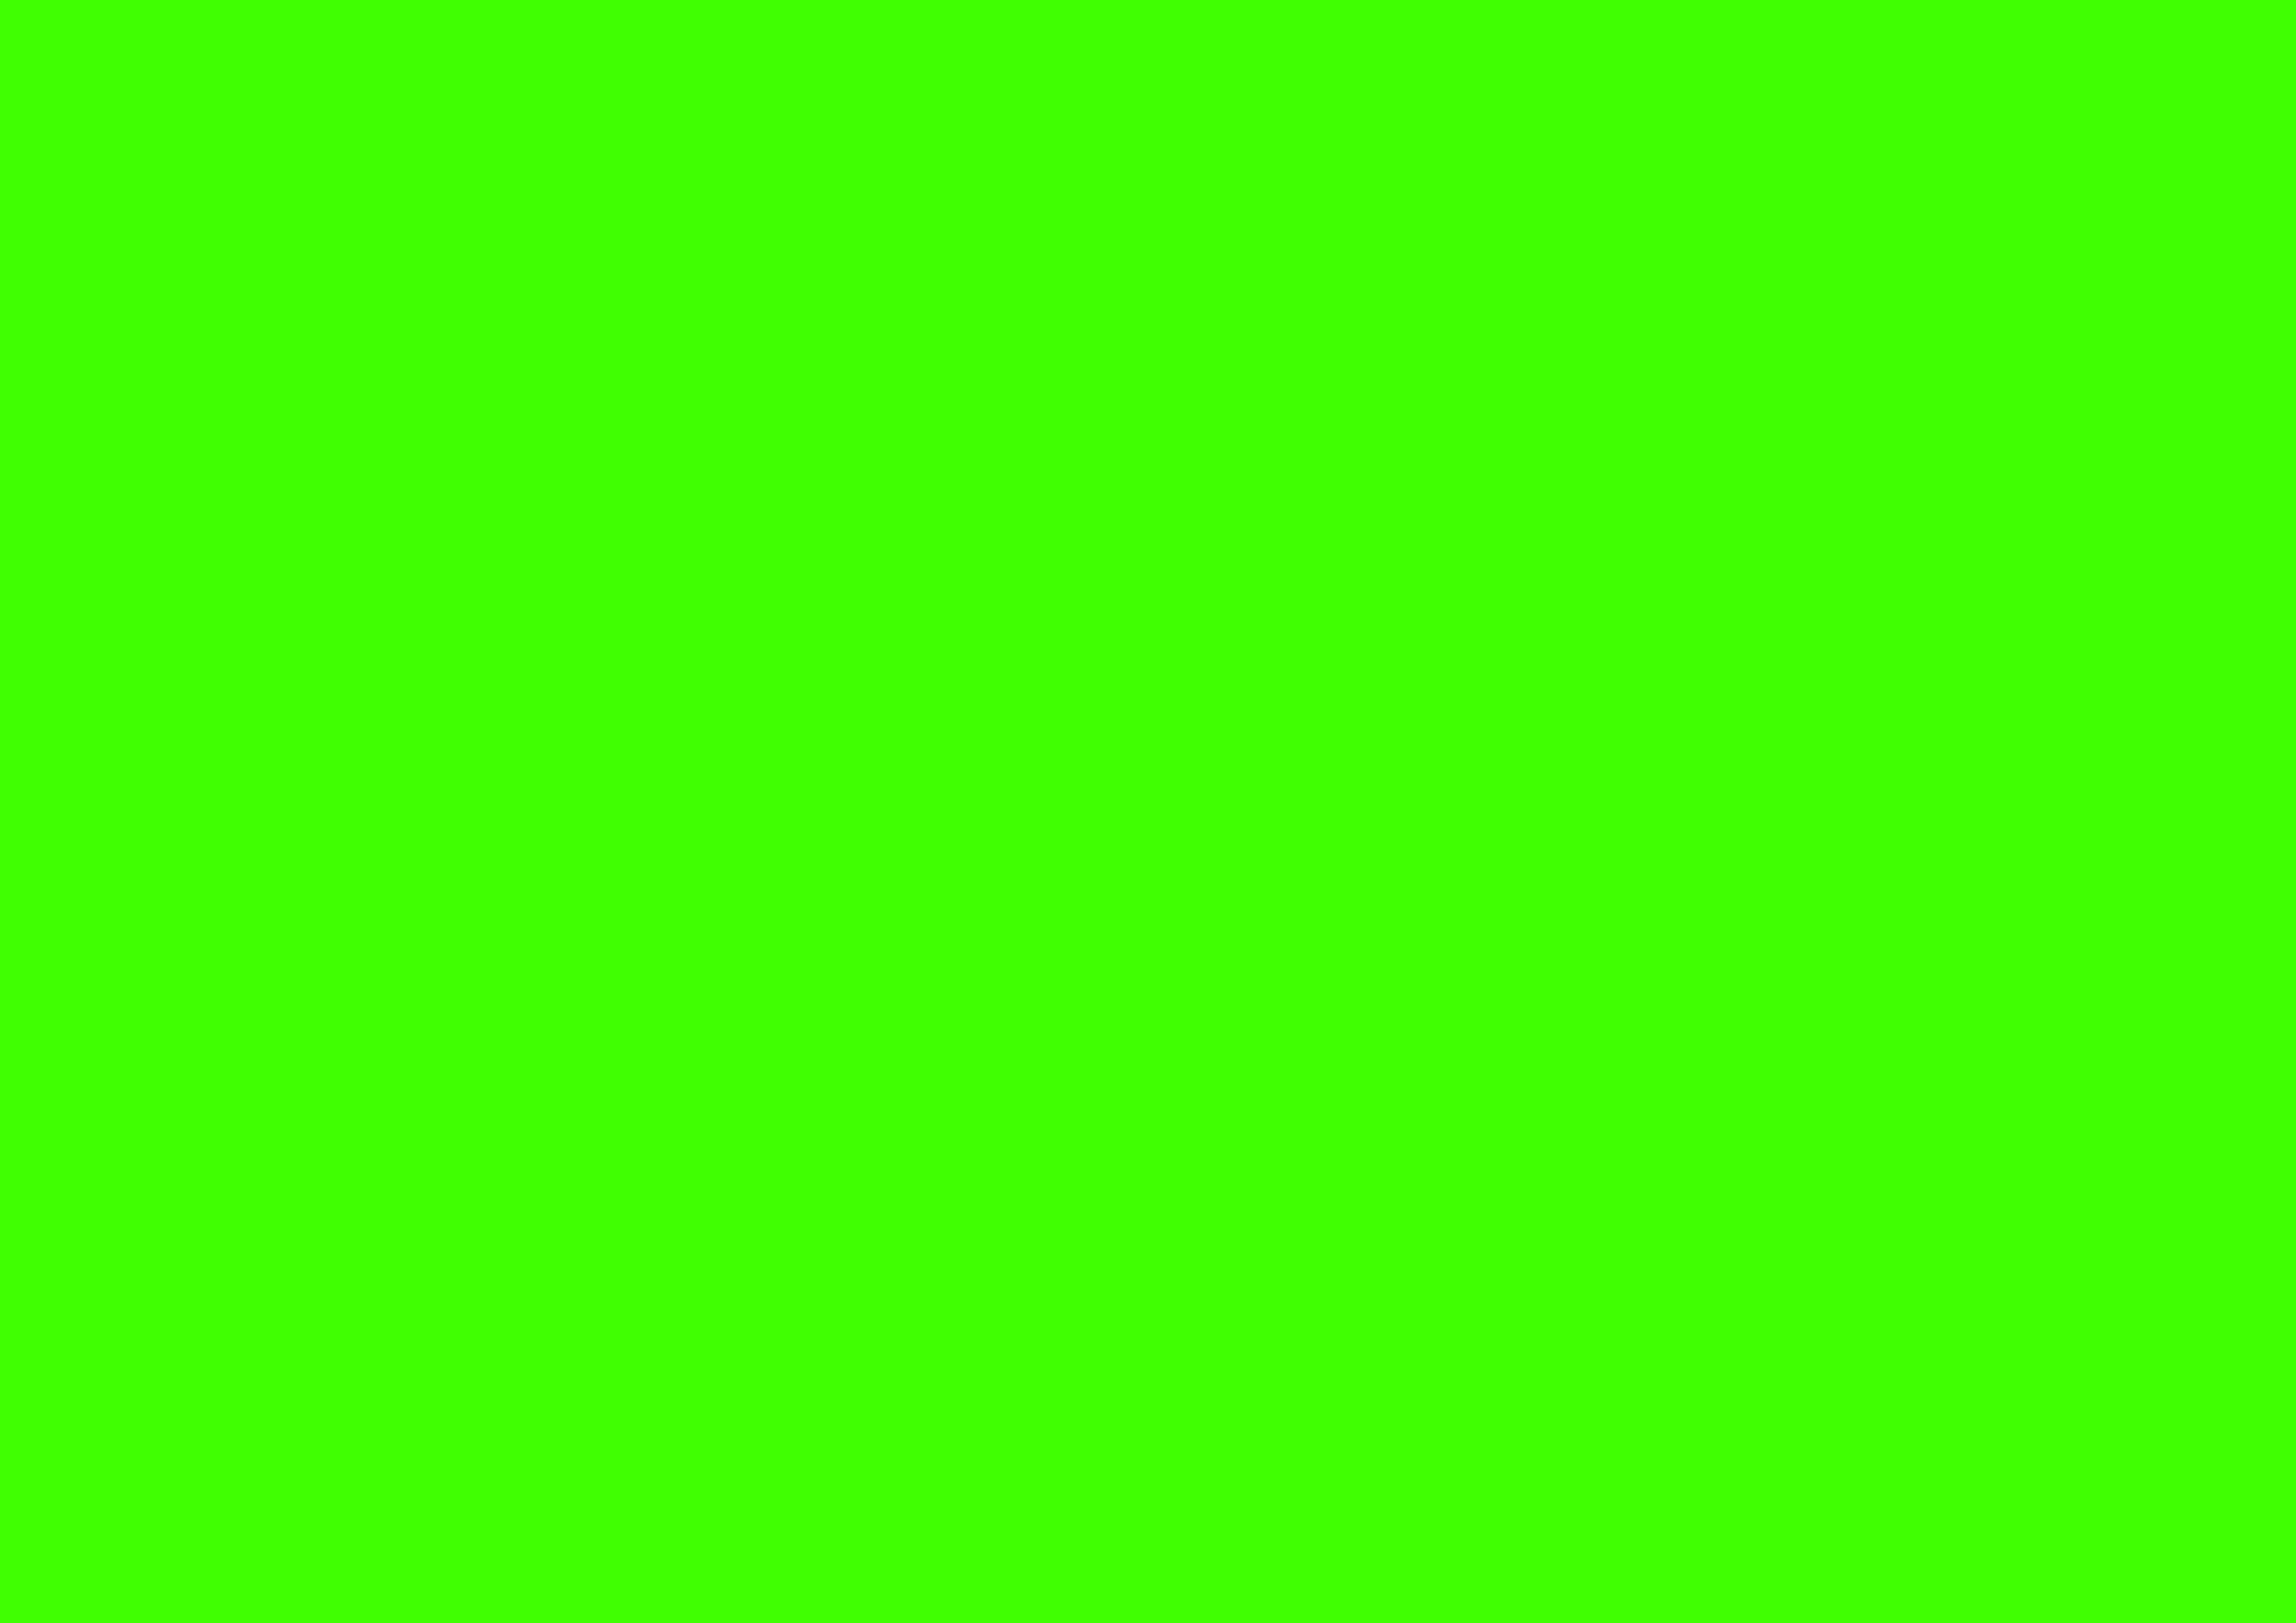 3508x2480 Harlequin Solid Color Background